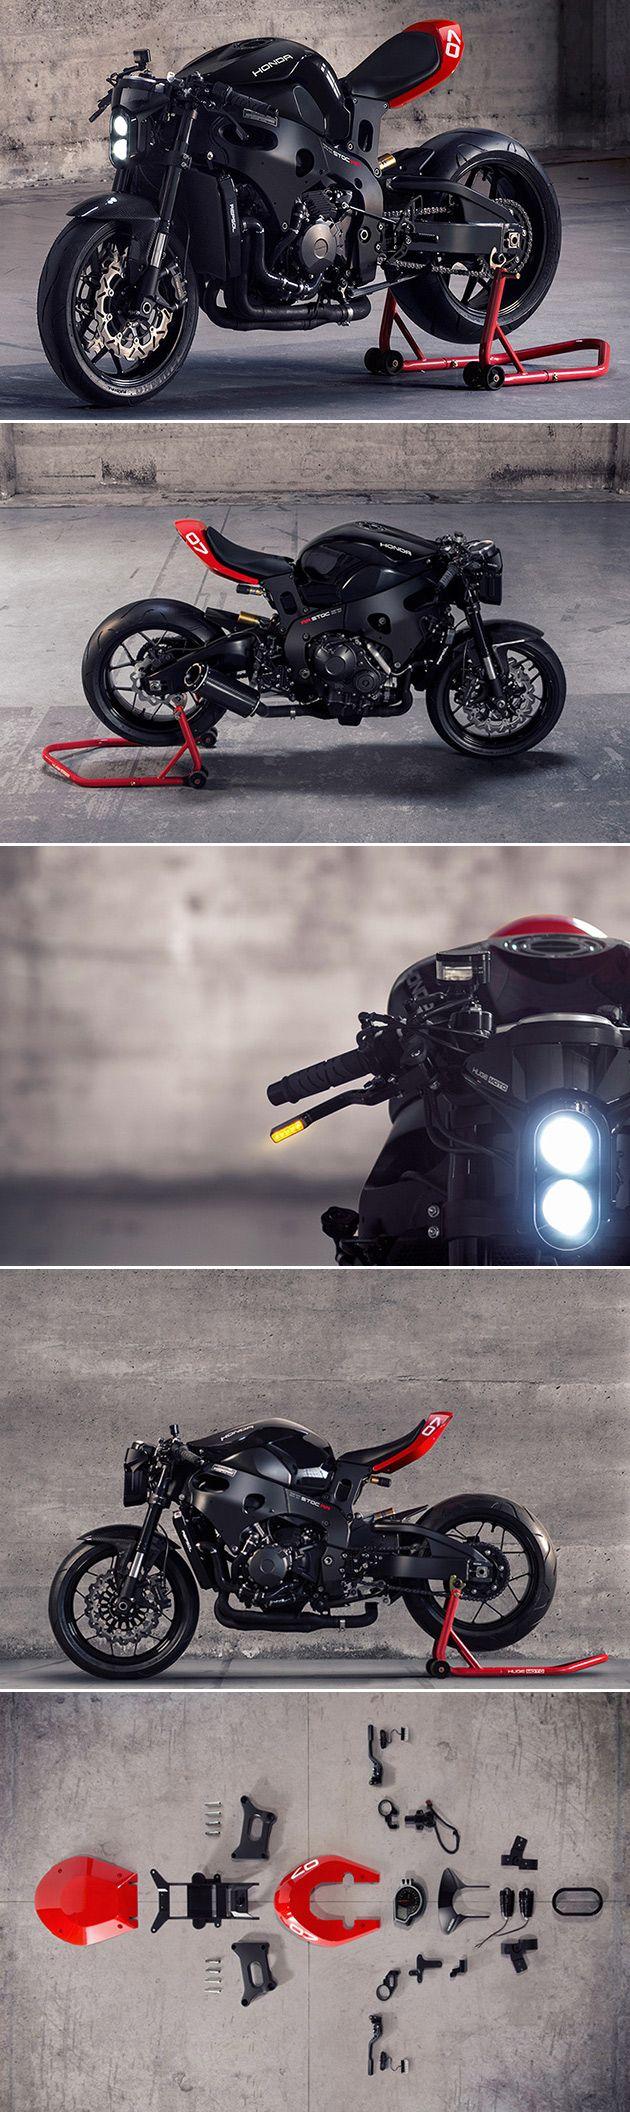 Huge MOTO Honda CBR1000RR Black Looks Like a Stealth Fighter, is a Bolt-On Kit